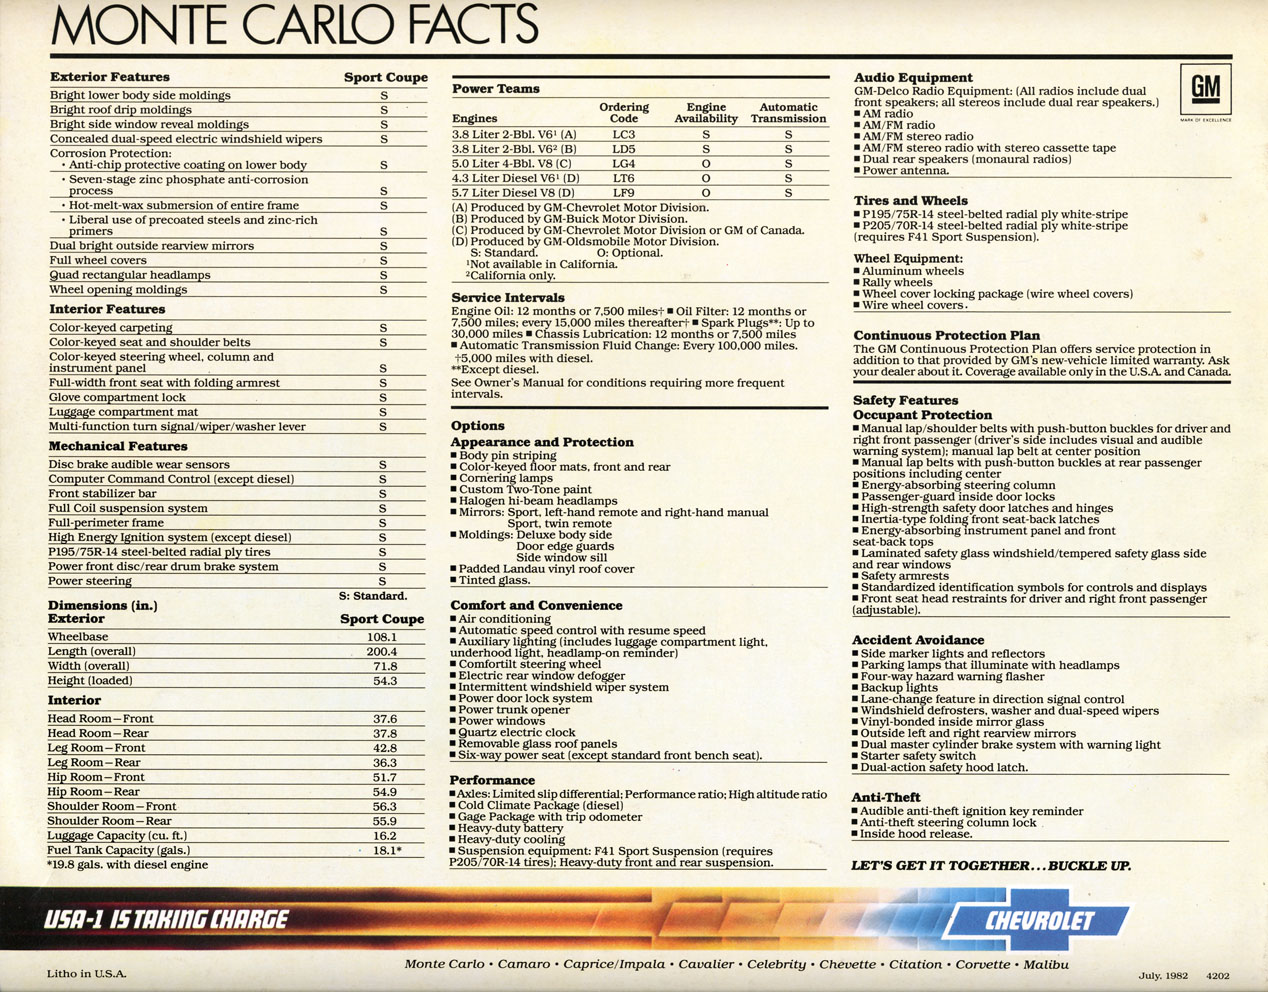 1983 Chevrolet Monte Carlo.